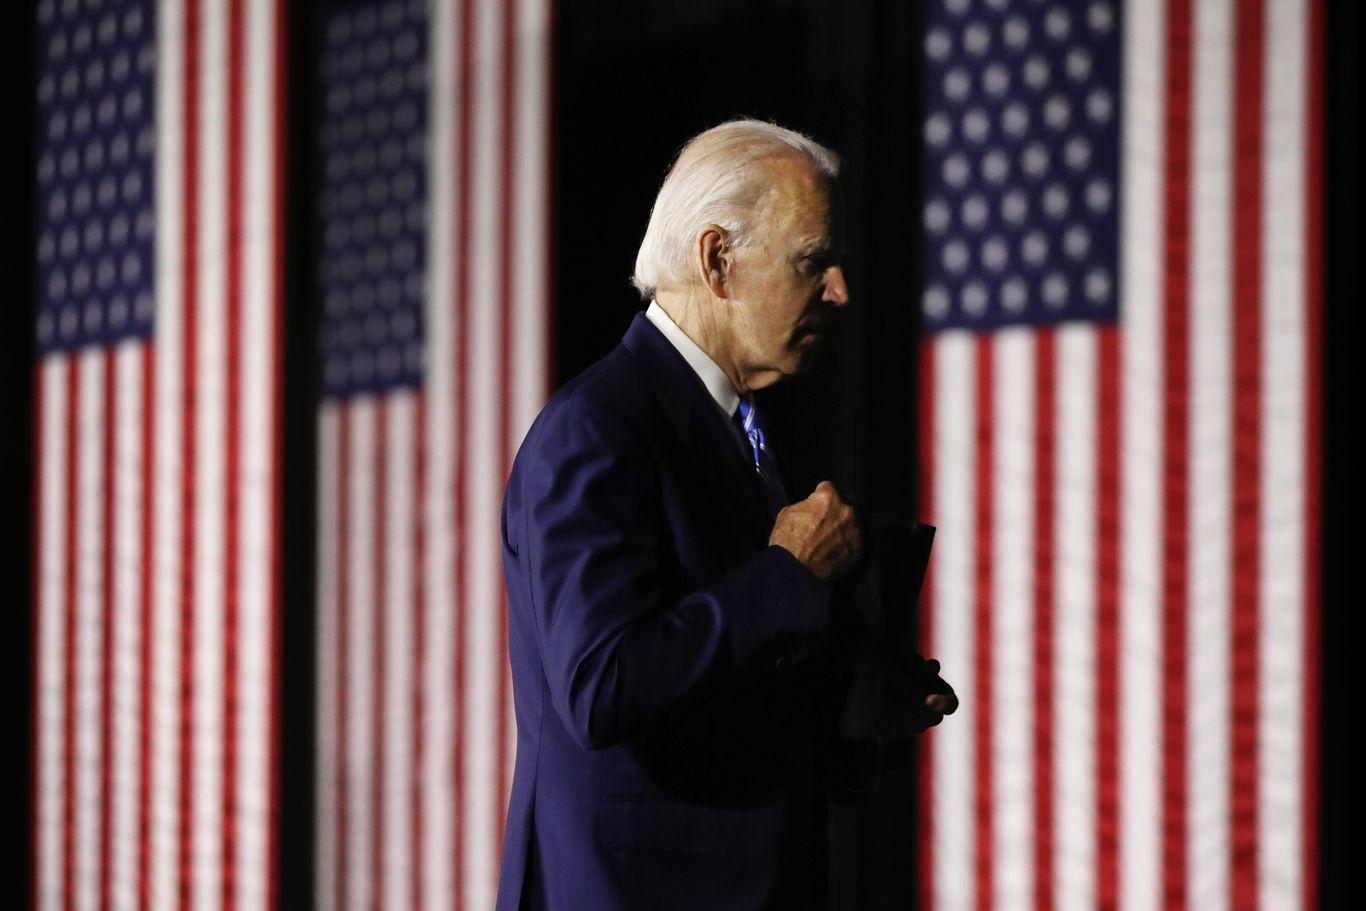 Joe Biden releases five-point plan to reopen schools safely amid coronavirus pandemic thumbnail